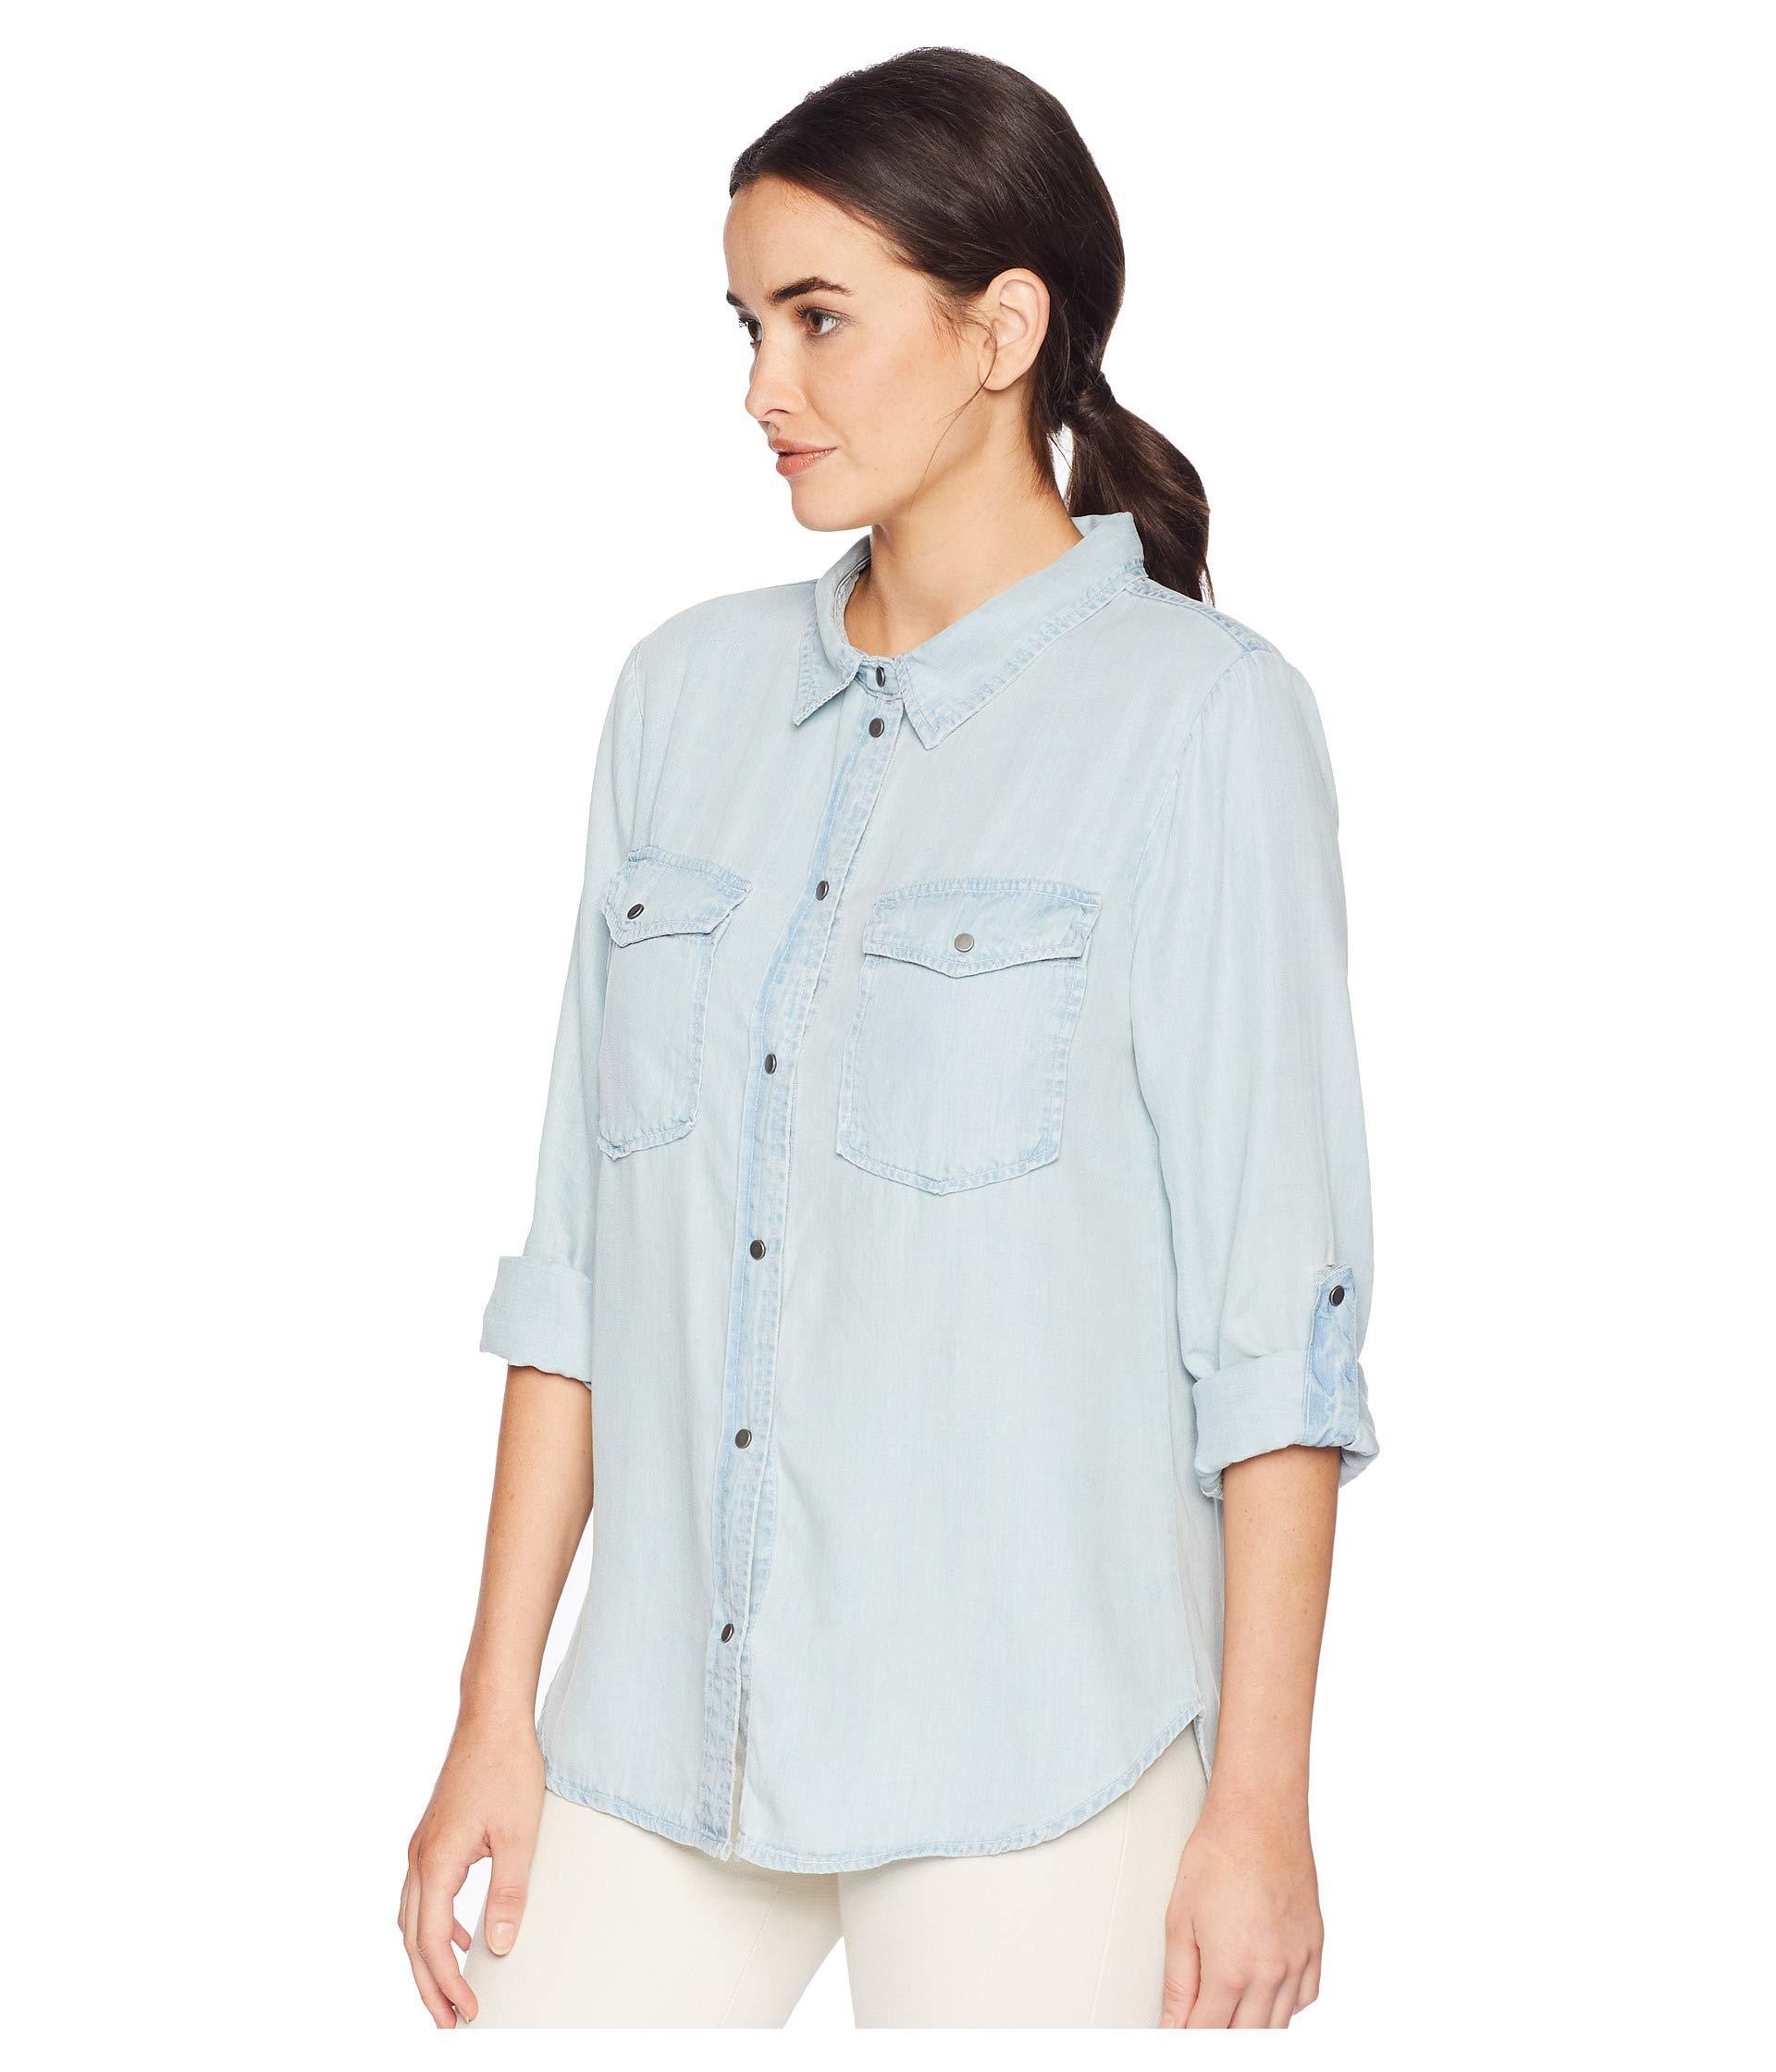 online store b9a36 70805 Jean Long Sleeve Shirt For Womens